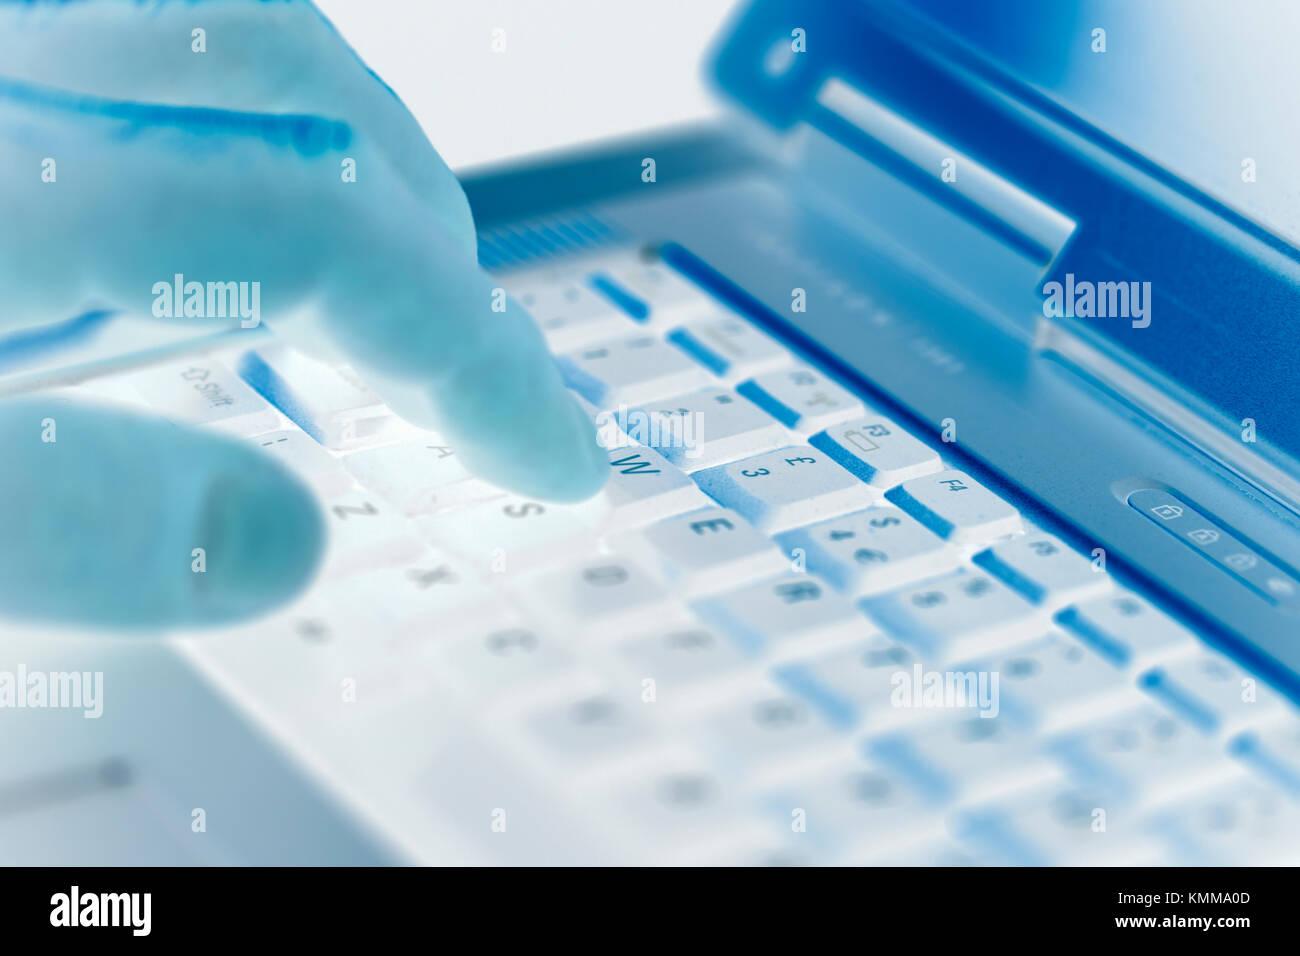 Man pressing a key on a laptop keyboard - Stock Image